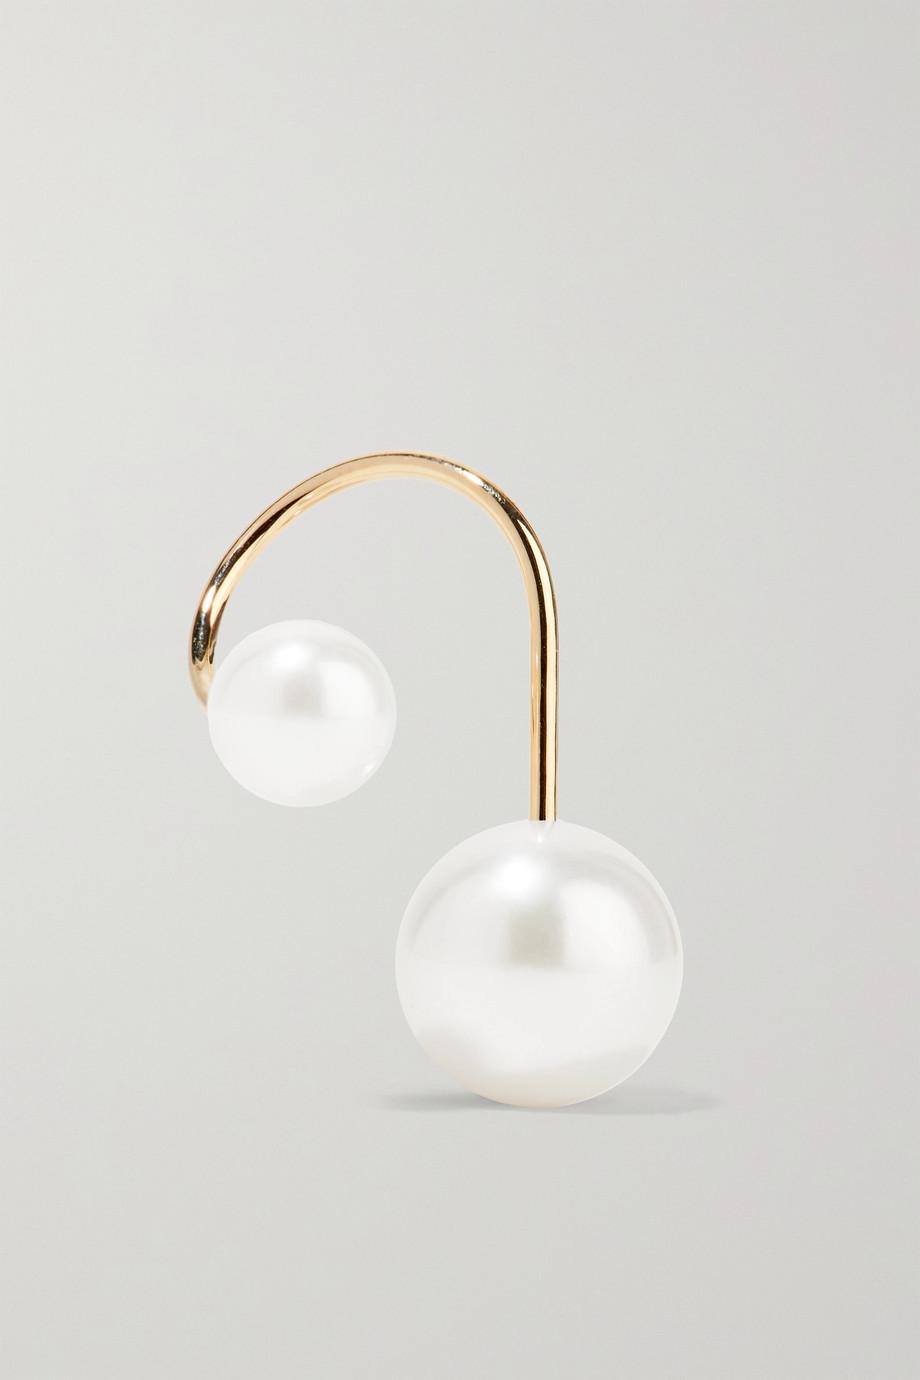 Sophie Bille Brahe Petite Elipse Nouveau 14-karat gold pearl earring